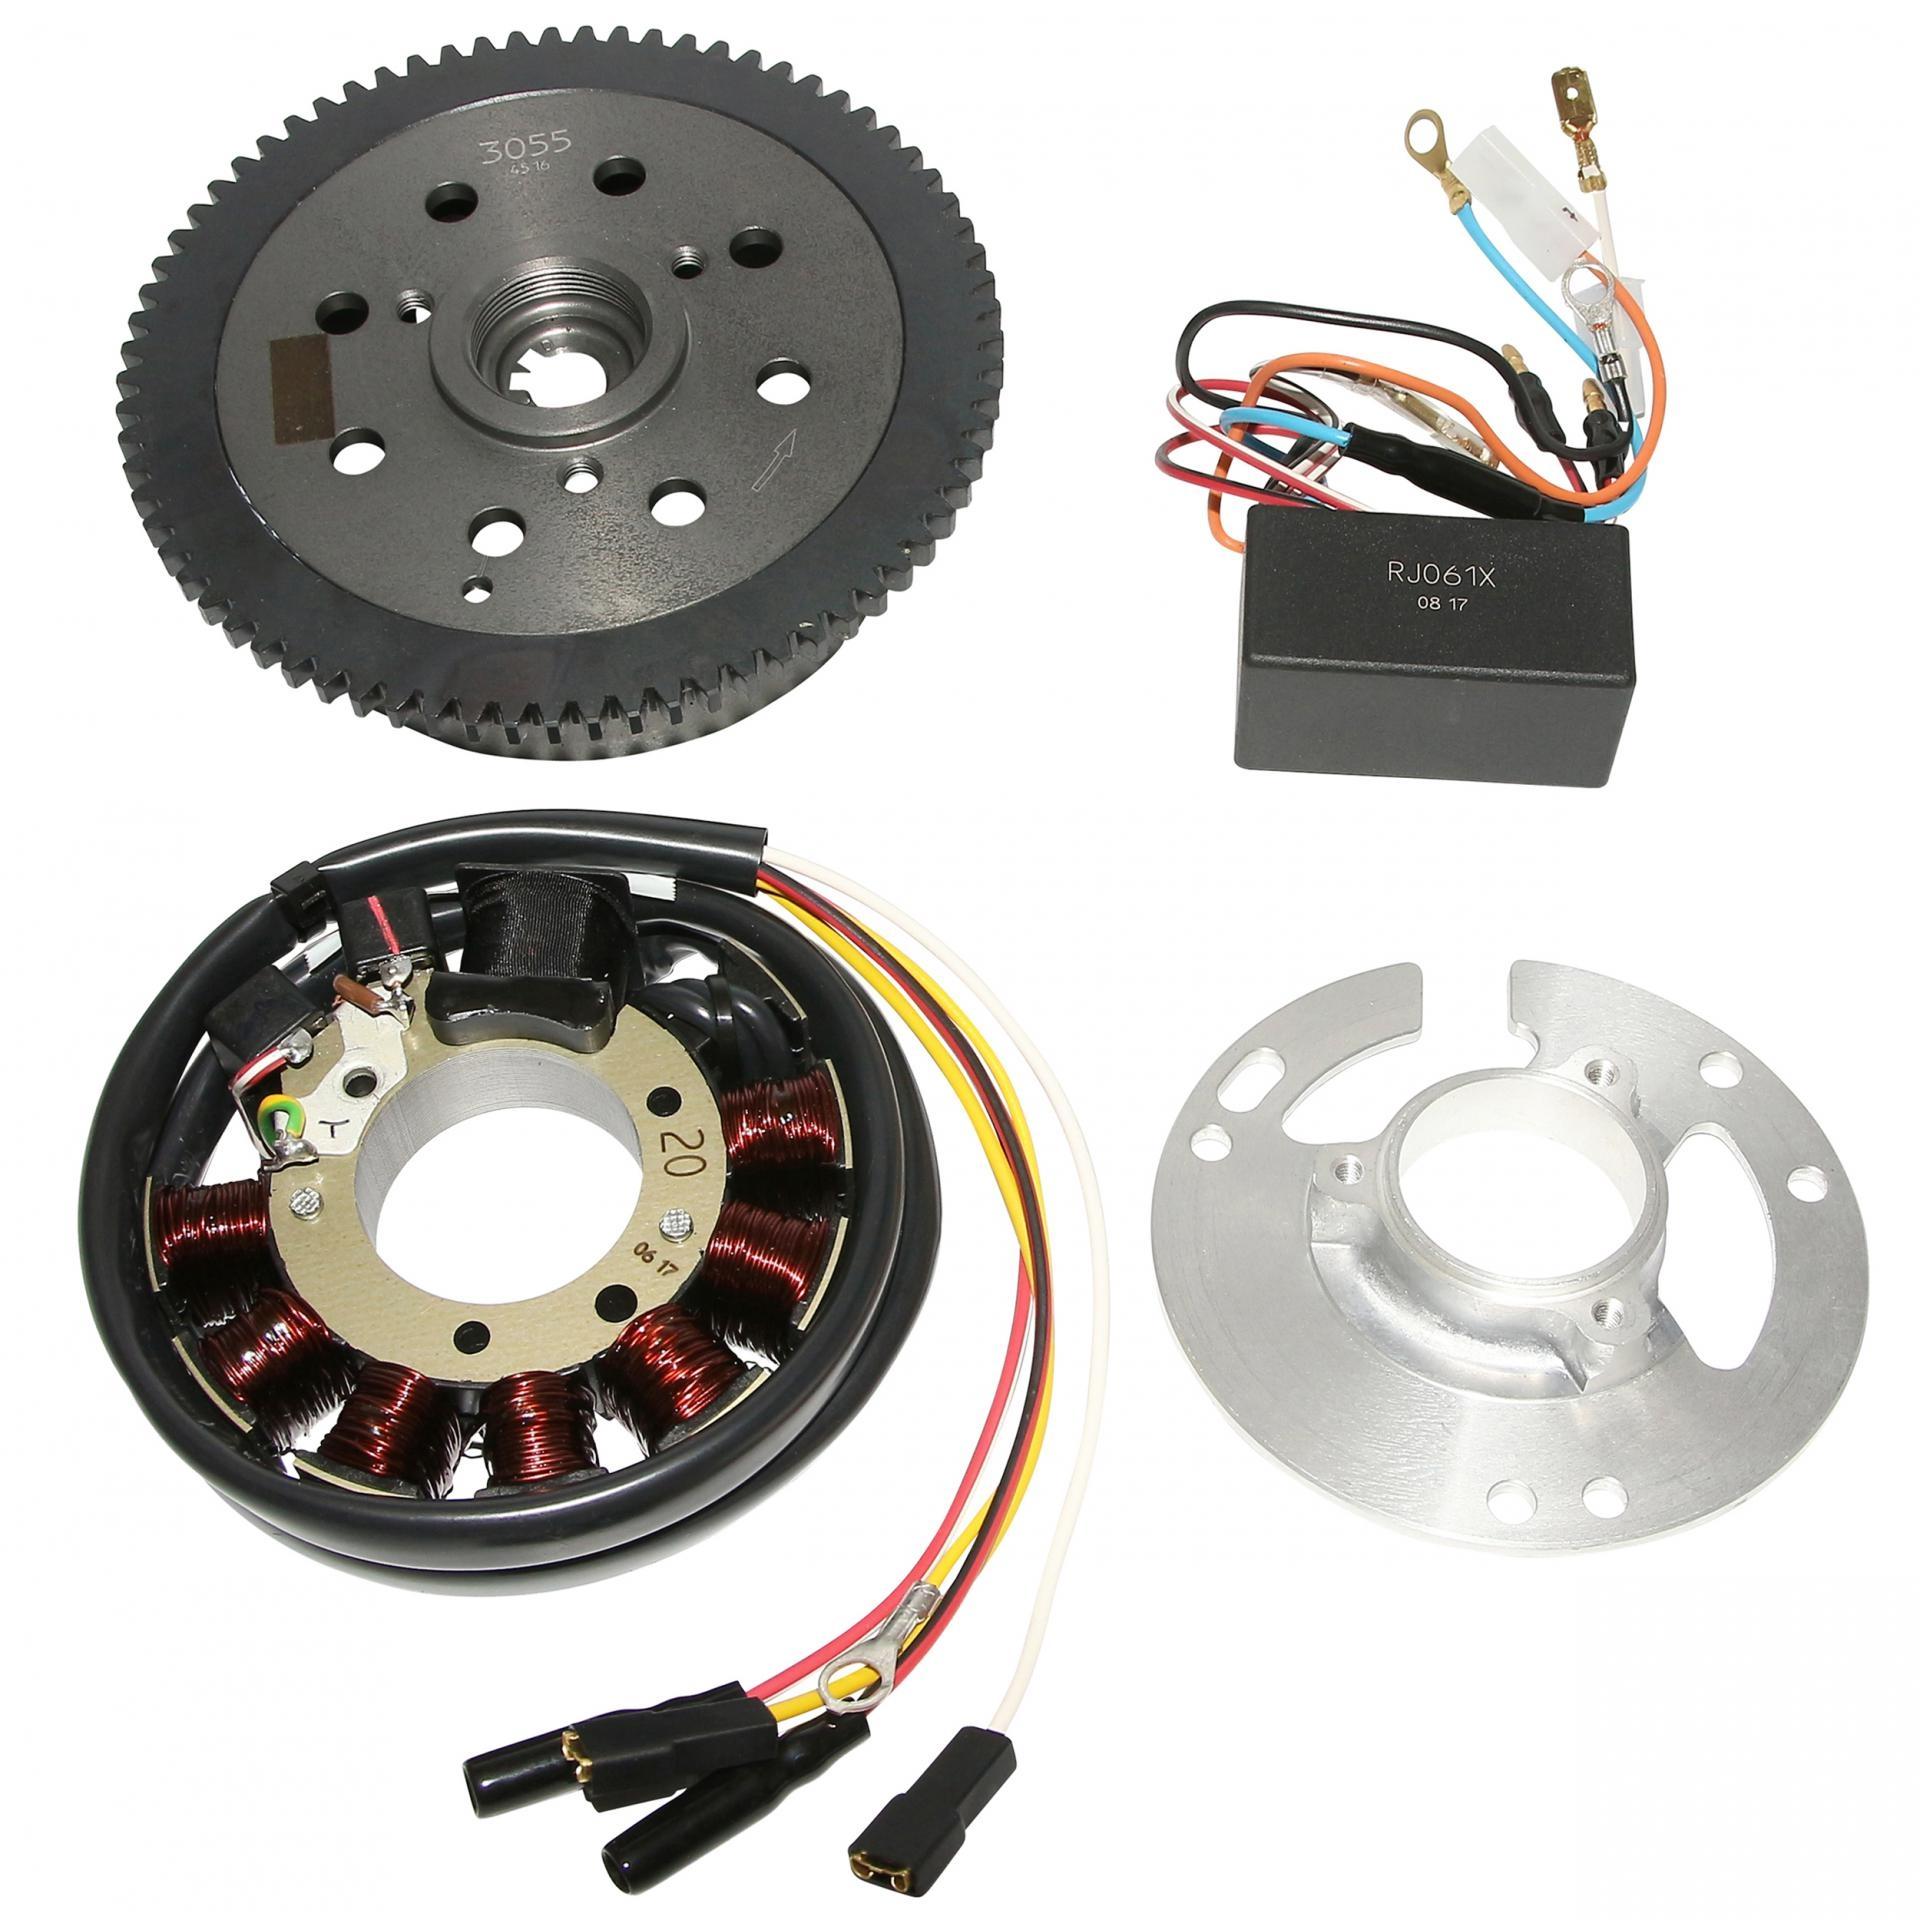 Allumage analogique KRD Yamaha TZR / MBK X-Power 04-